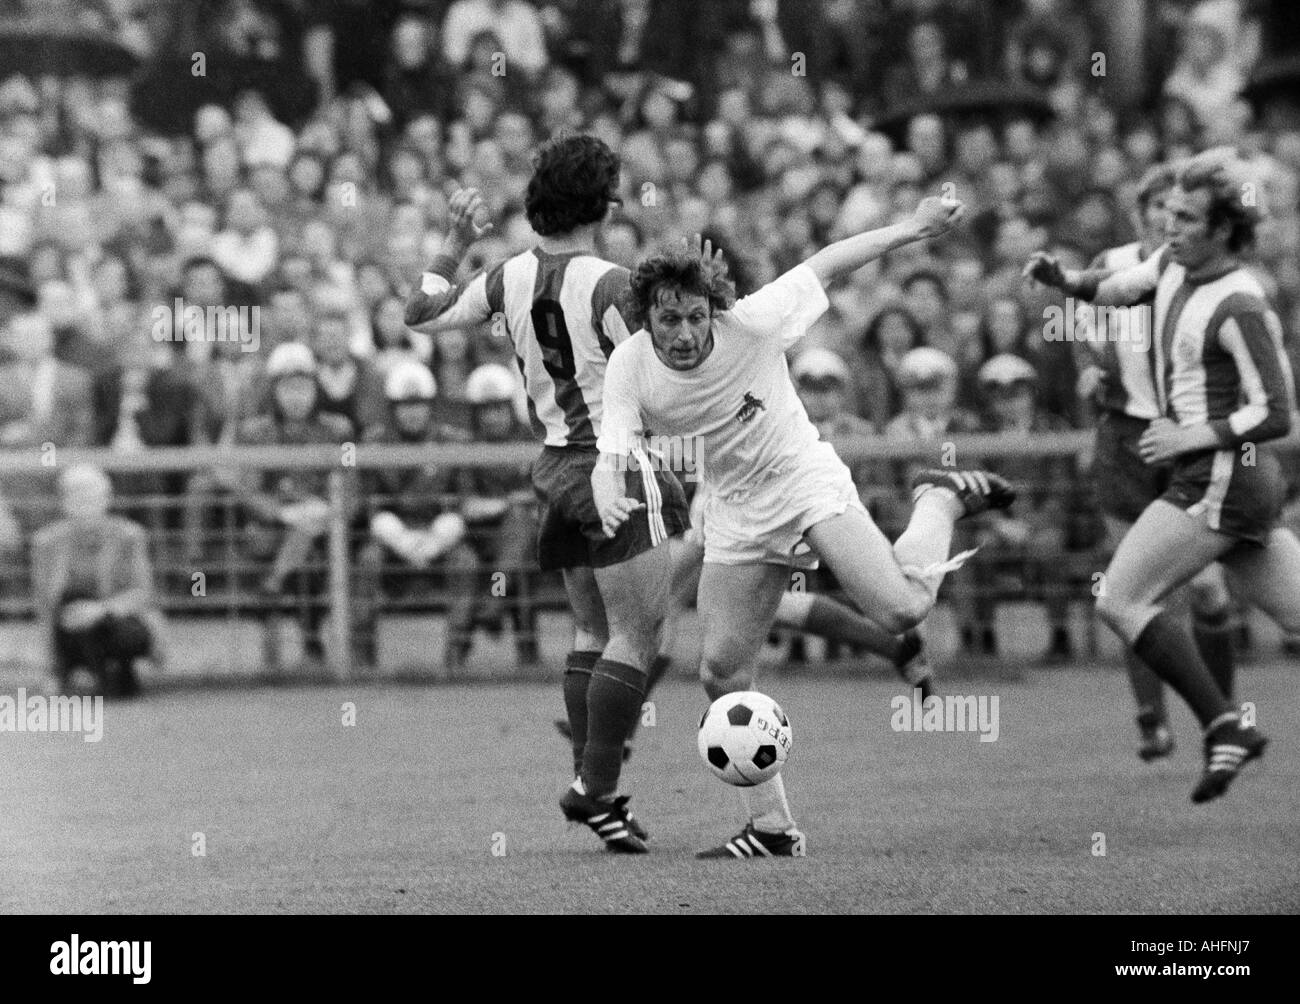 football, Bundesliga, 1971/1972, Stadium Radrennbahn near the Muengersdorfer Stadium in Cologne, 1. FC Cologne versus FC Bayern Munich 1:4, scene of the match, f.l.t.r. Gerd Mueller (FCB), Heinz Flohe (Koeln), Ulrich Hoeness (FCB) - Stock Image